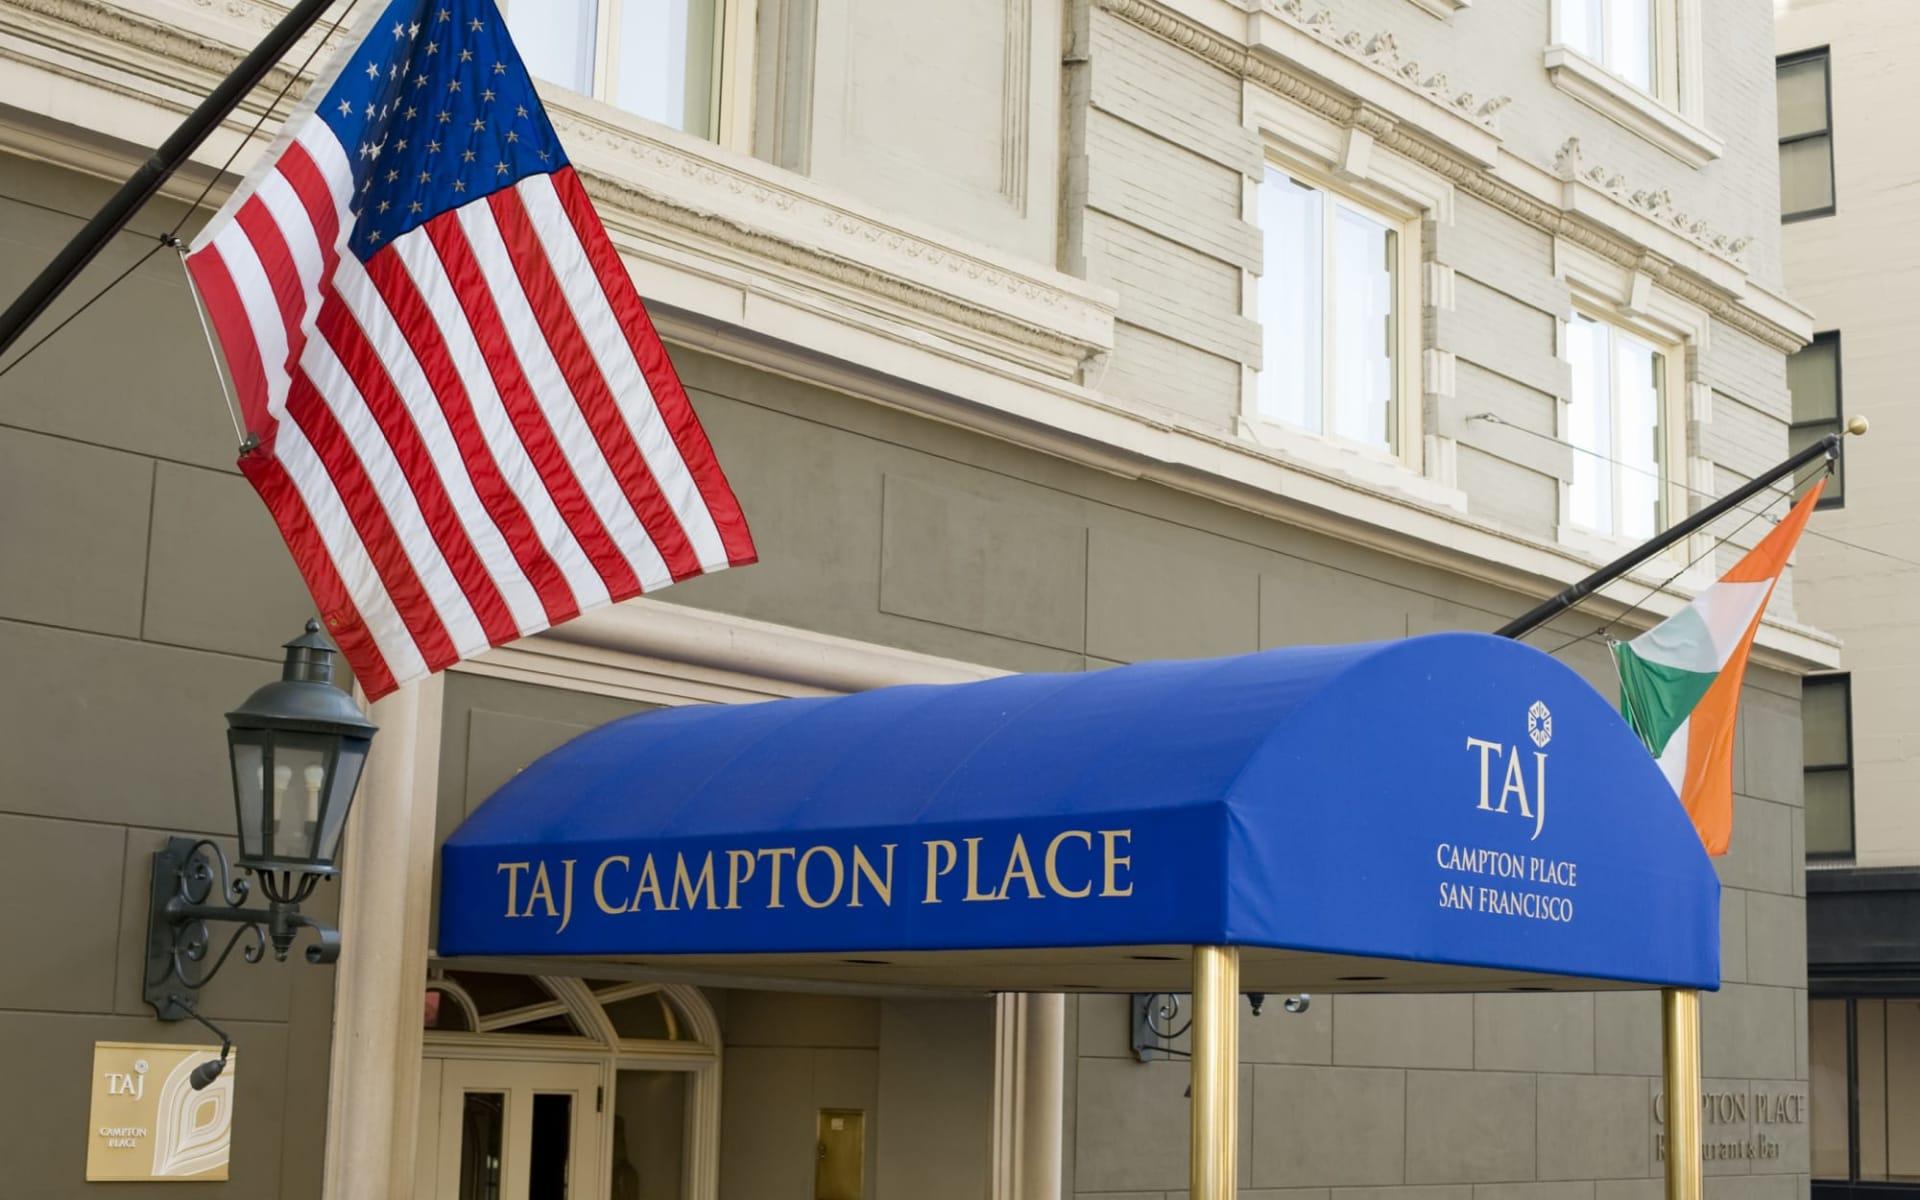 TAJ Campton Place in San Francisco:  Taj Campton _96_(300dpi)